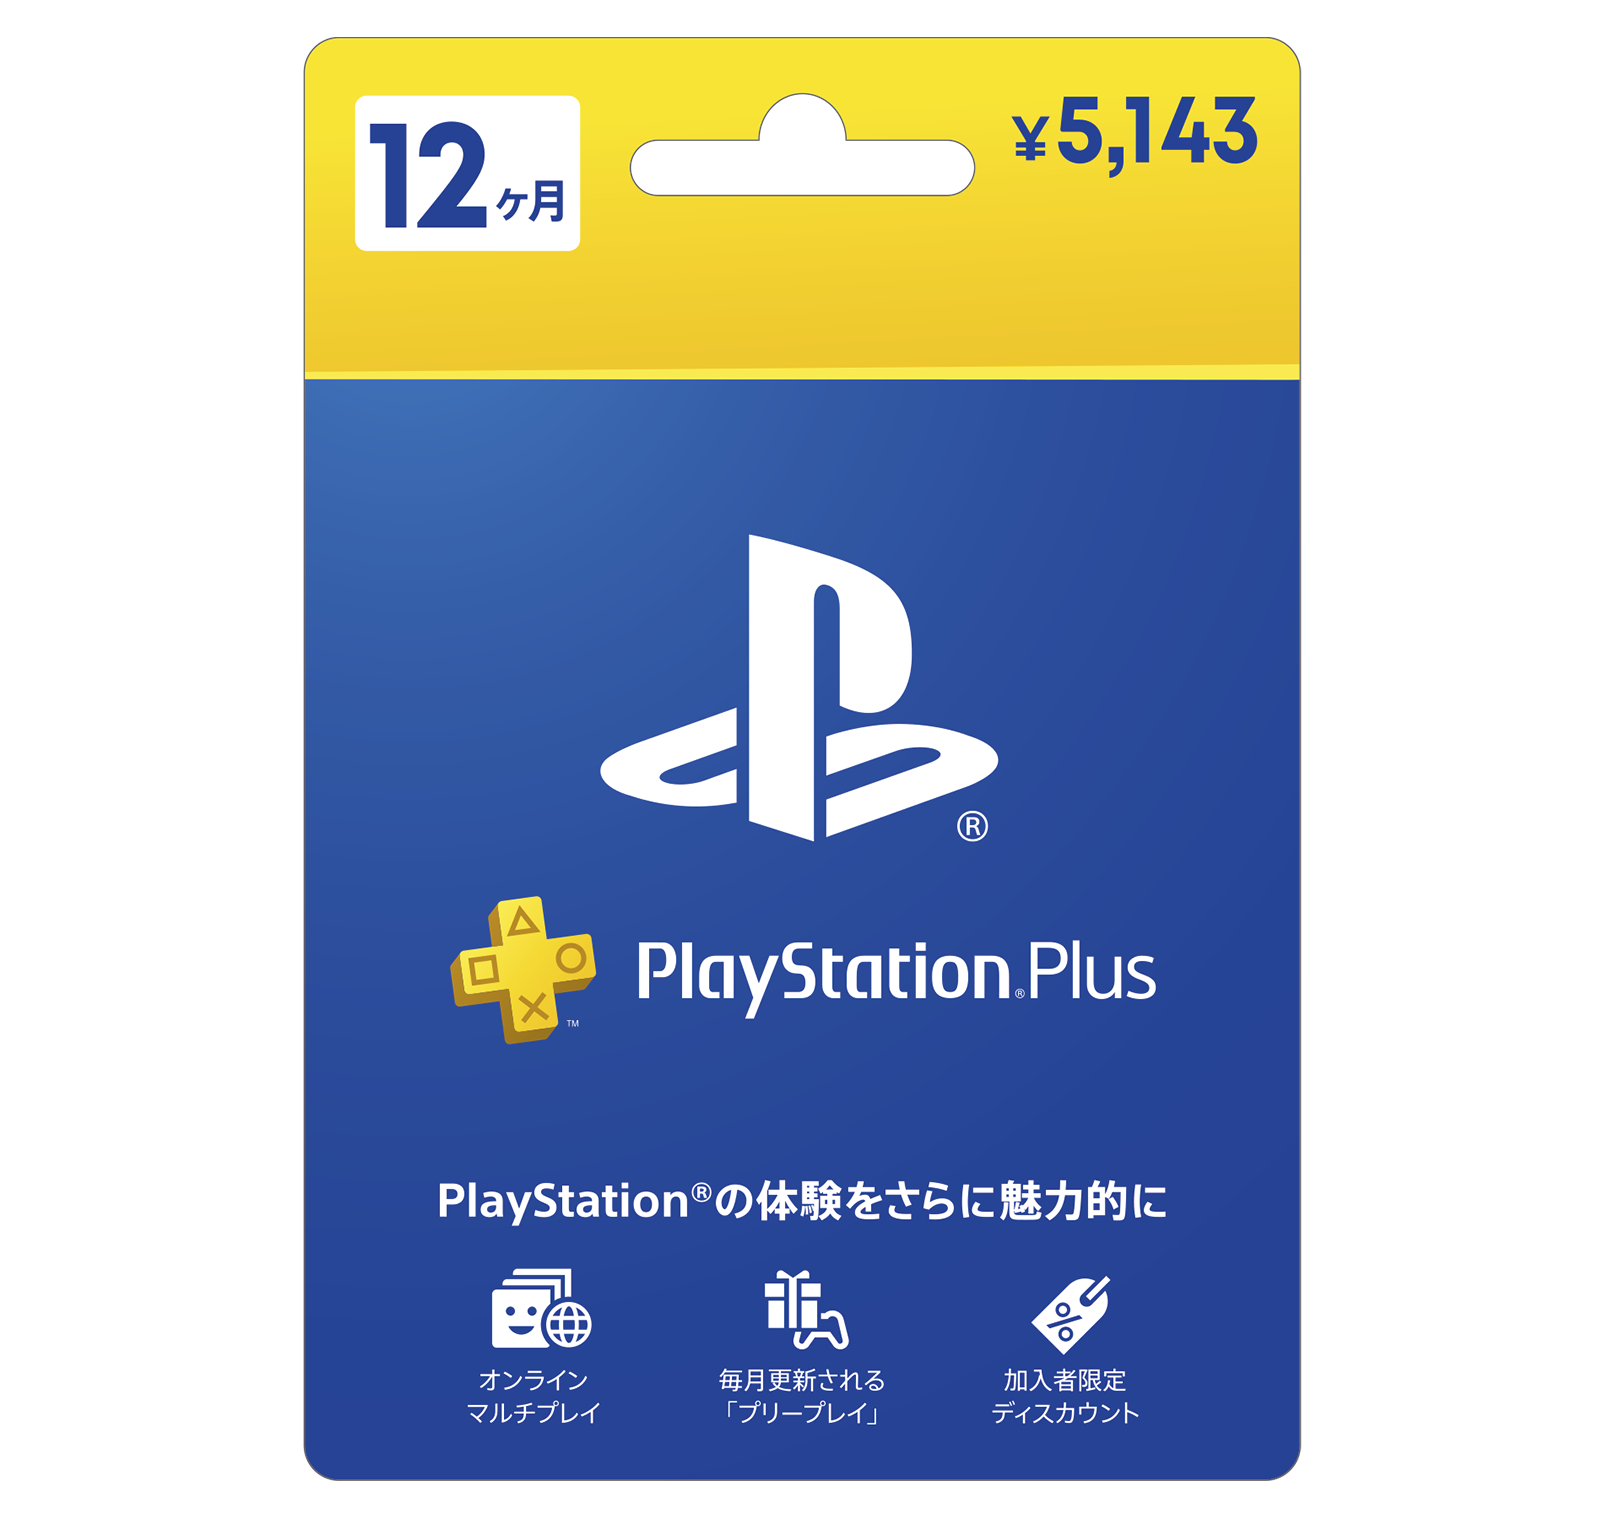 PS Plus 12ヶ月利用権